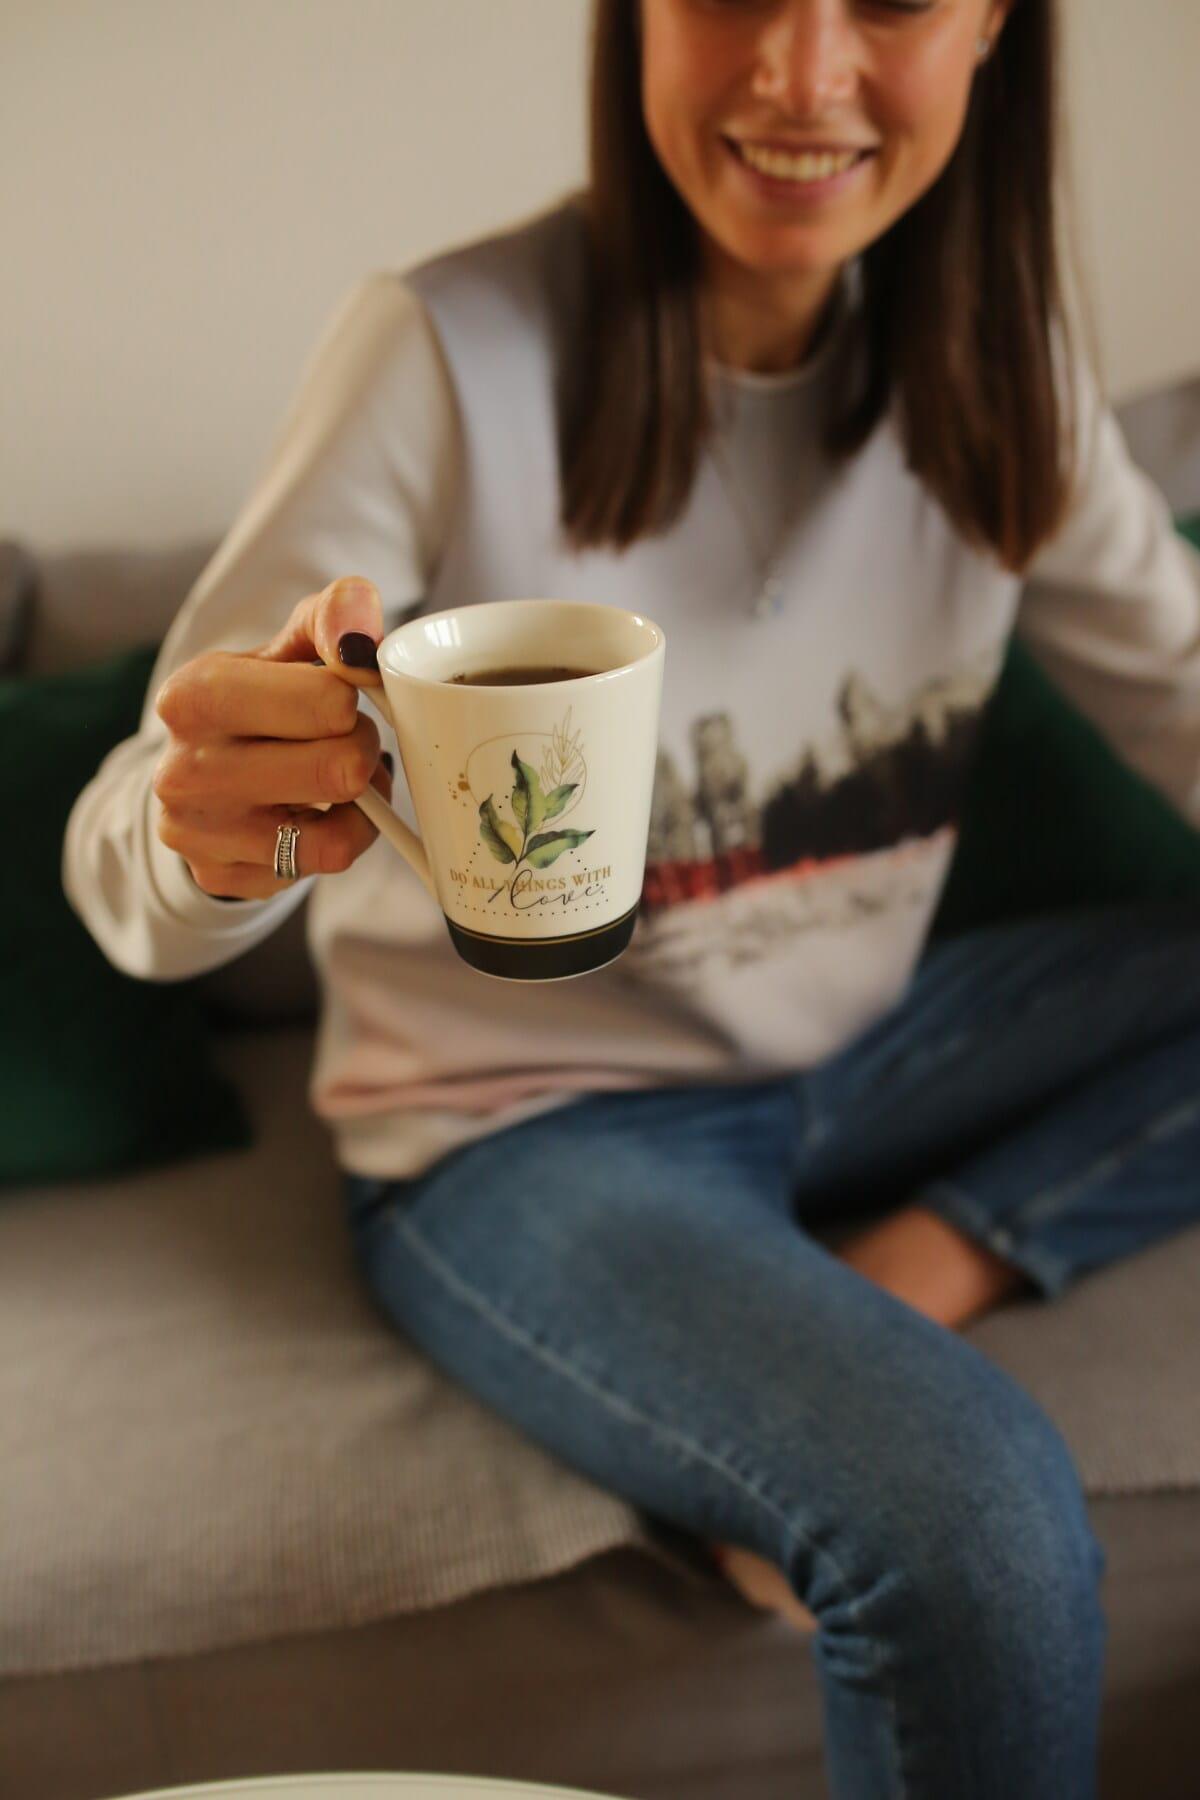 tea, mug, morning, young woman, aroma, breakfast, cup, woman, beverage, drink